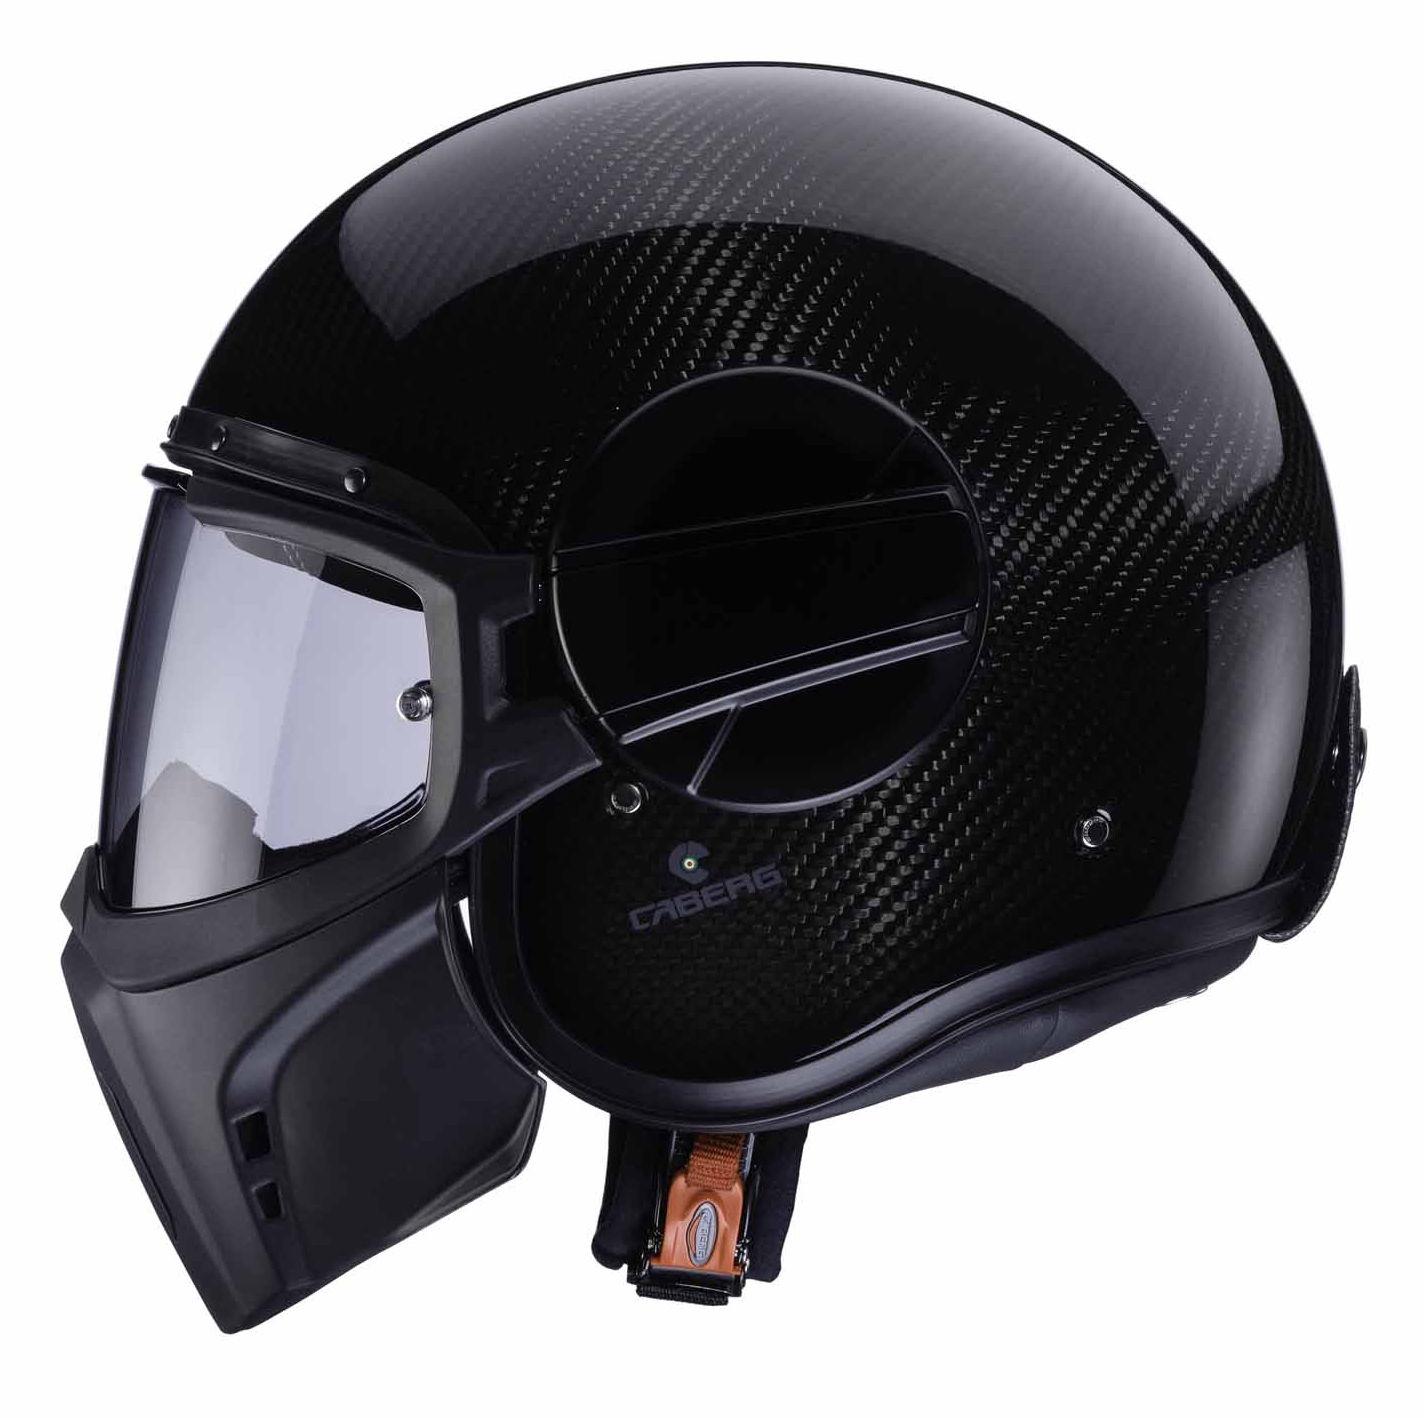 Caberg Ghost Carbon Helmet